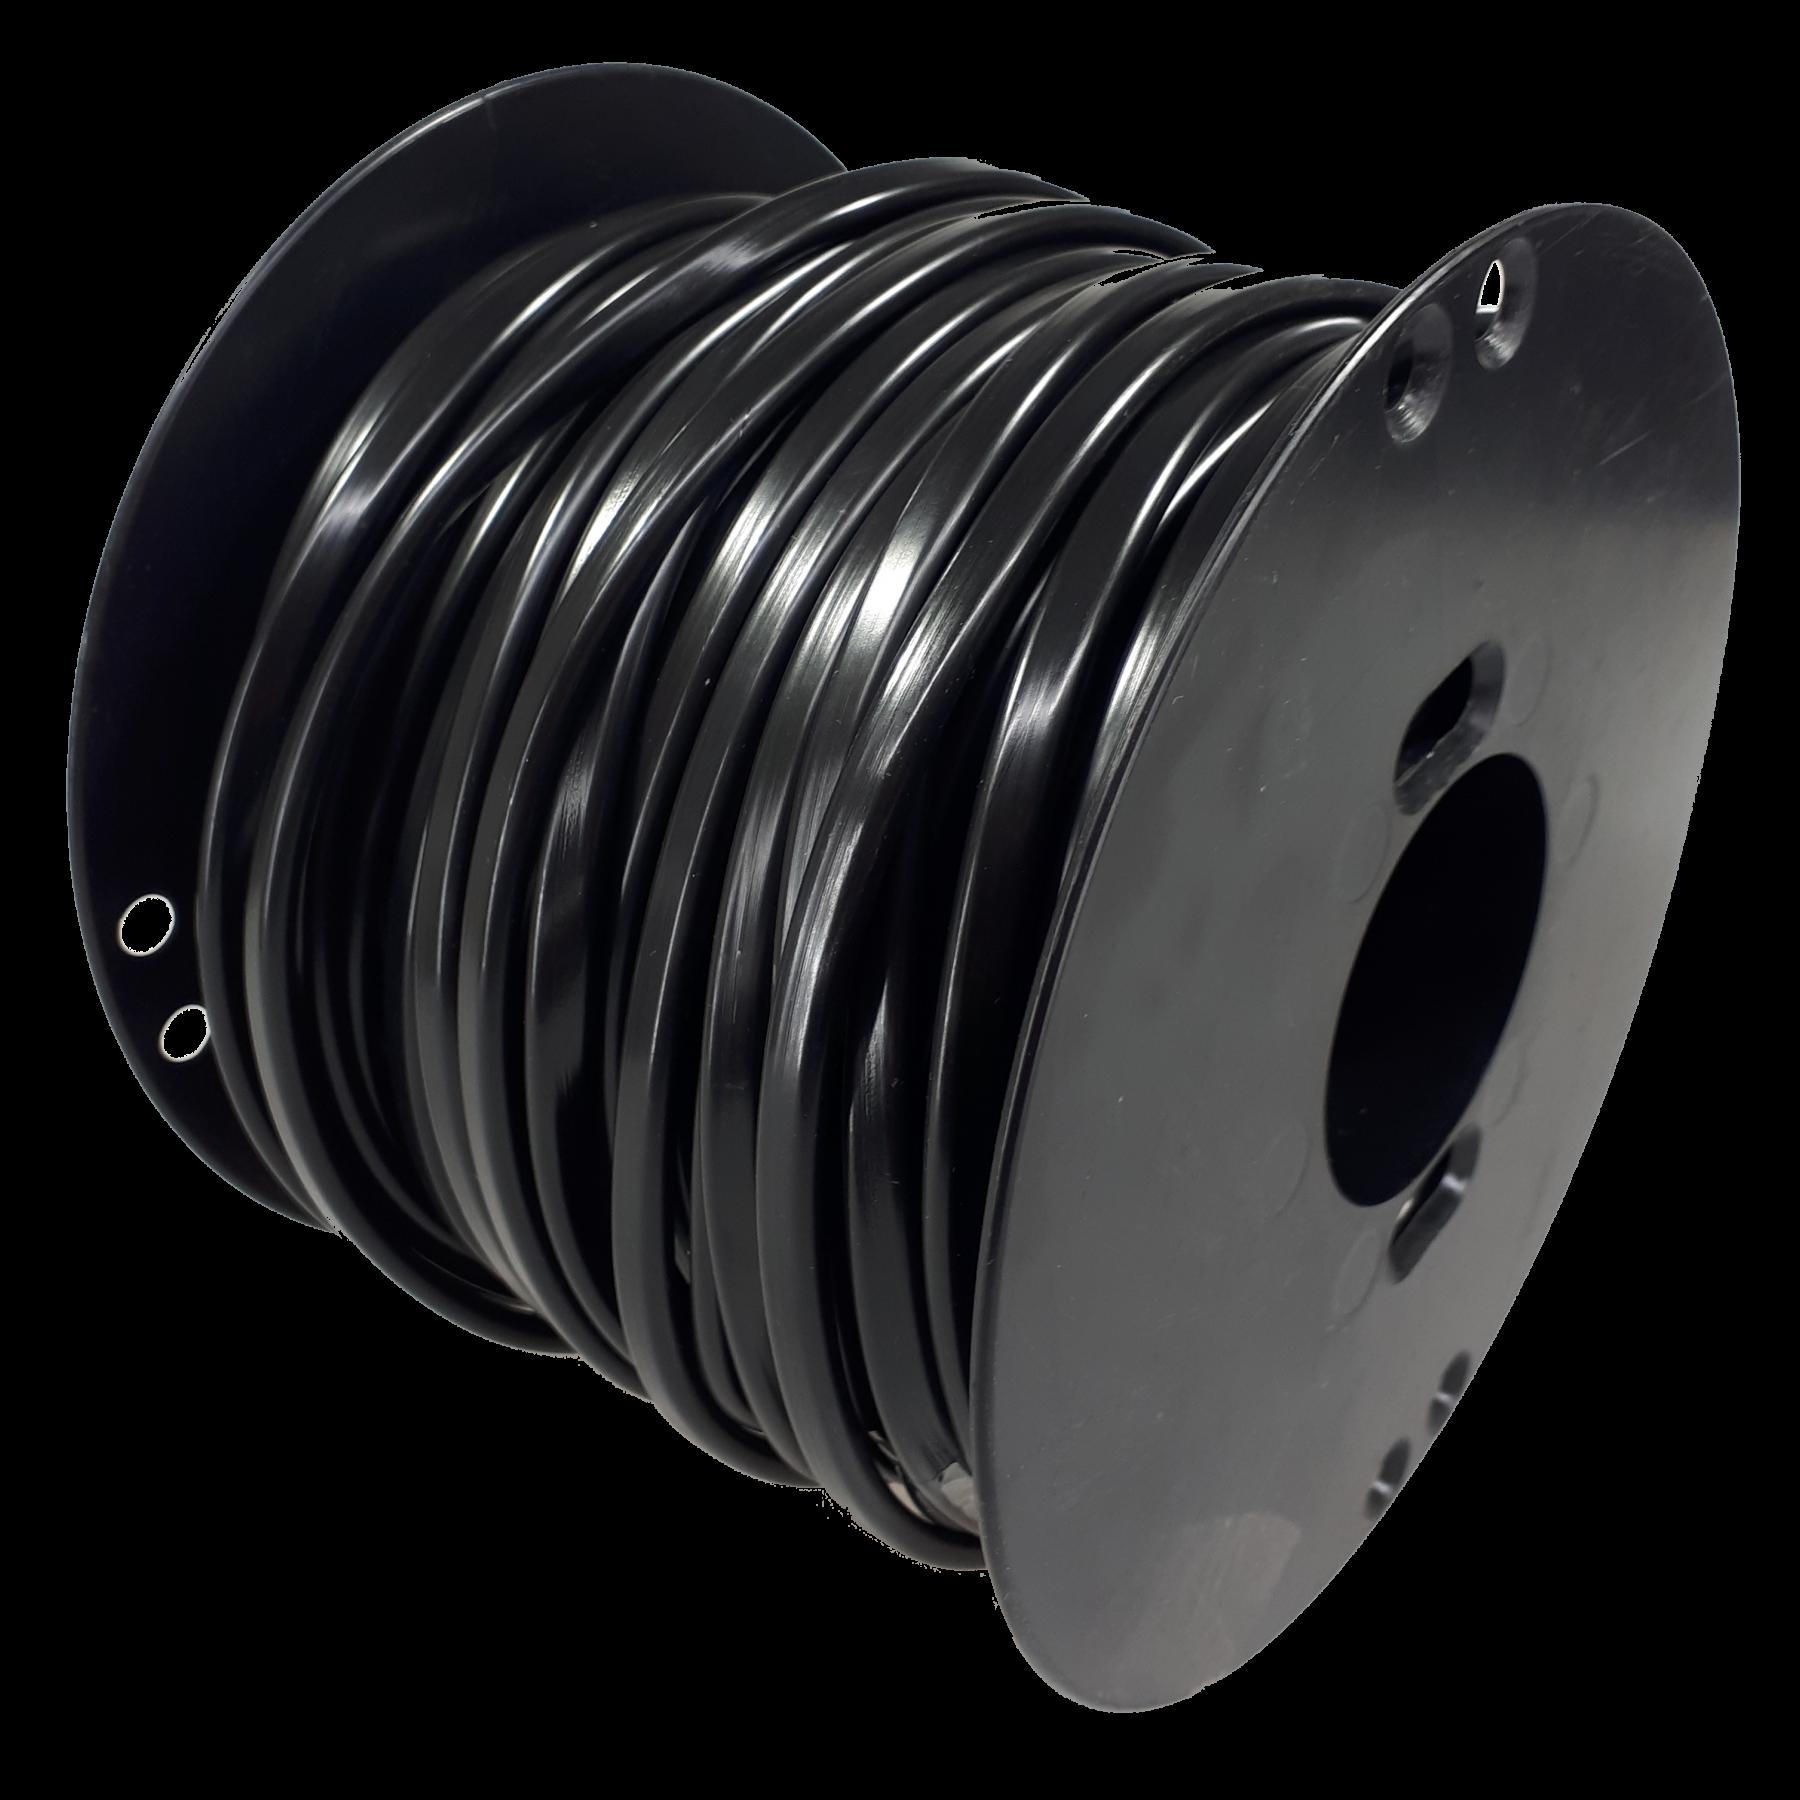 Kabel 2x2,5 plat 50m haspel